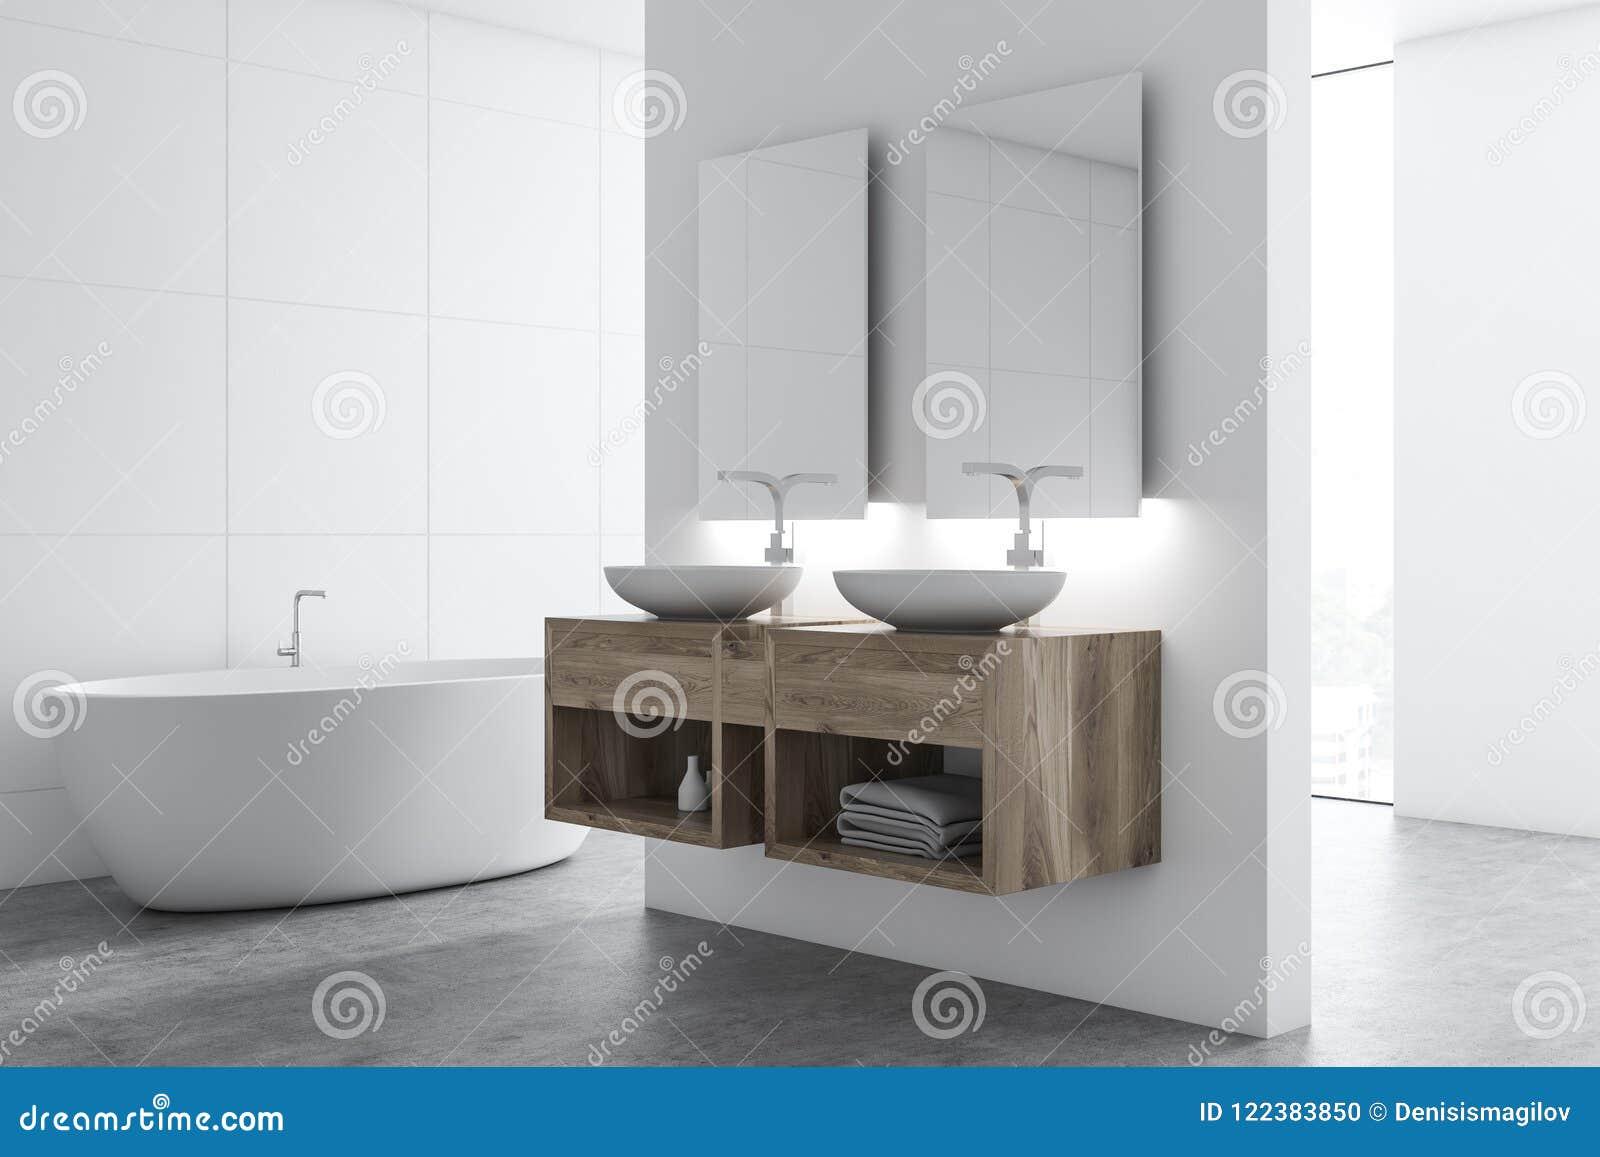 Corner Of A White Tile Bathroom Stock Illustration Illustration Of Metal Heap 122383850,Furnishing A New Home